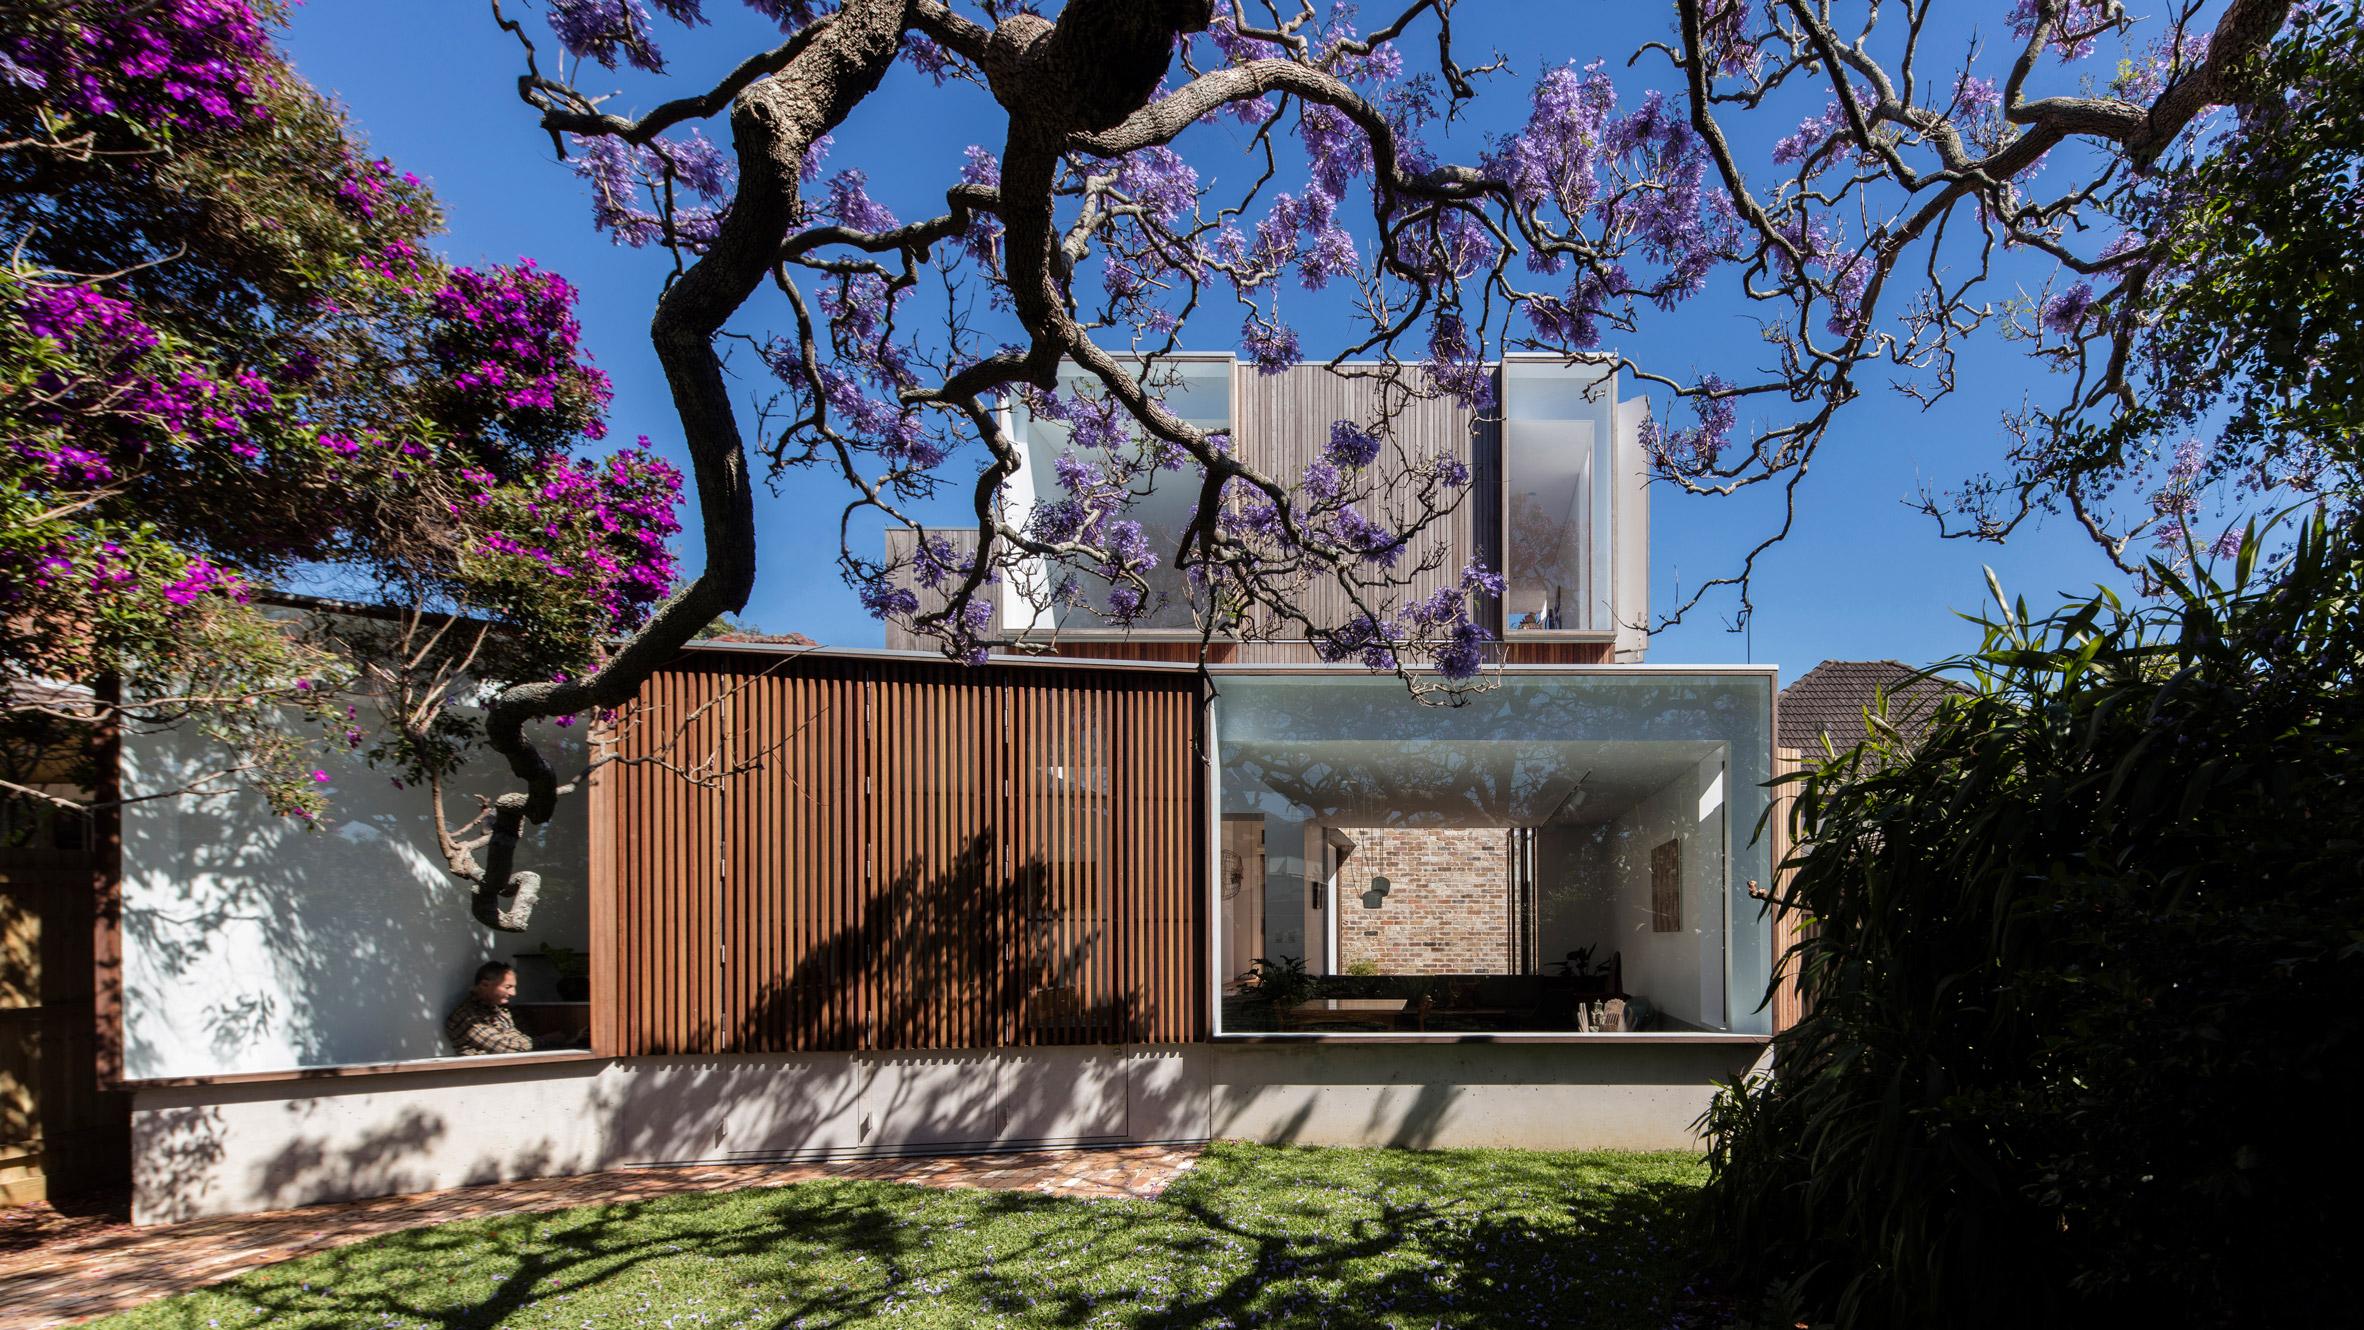 1917 Australian cottage gets a dazzling extension